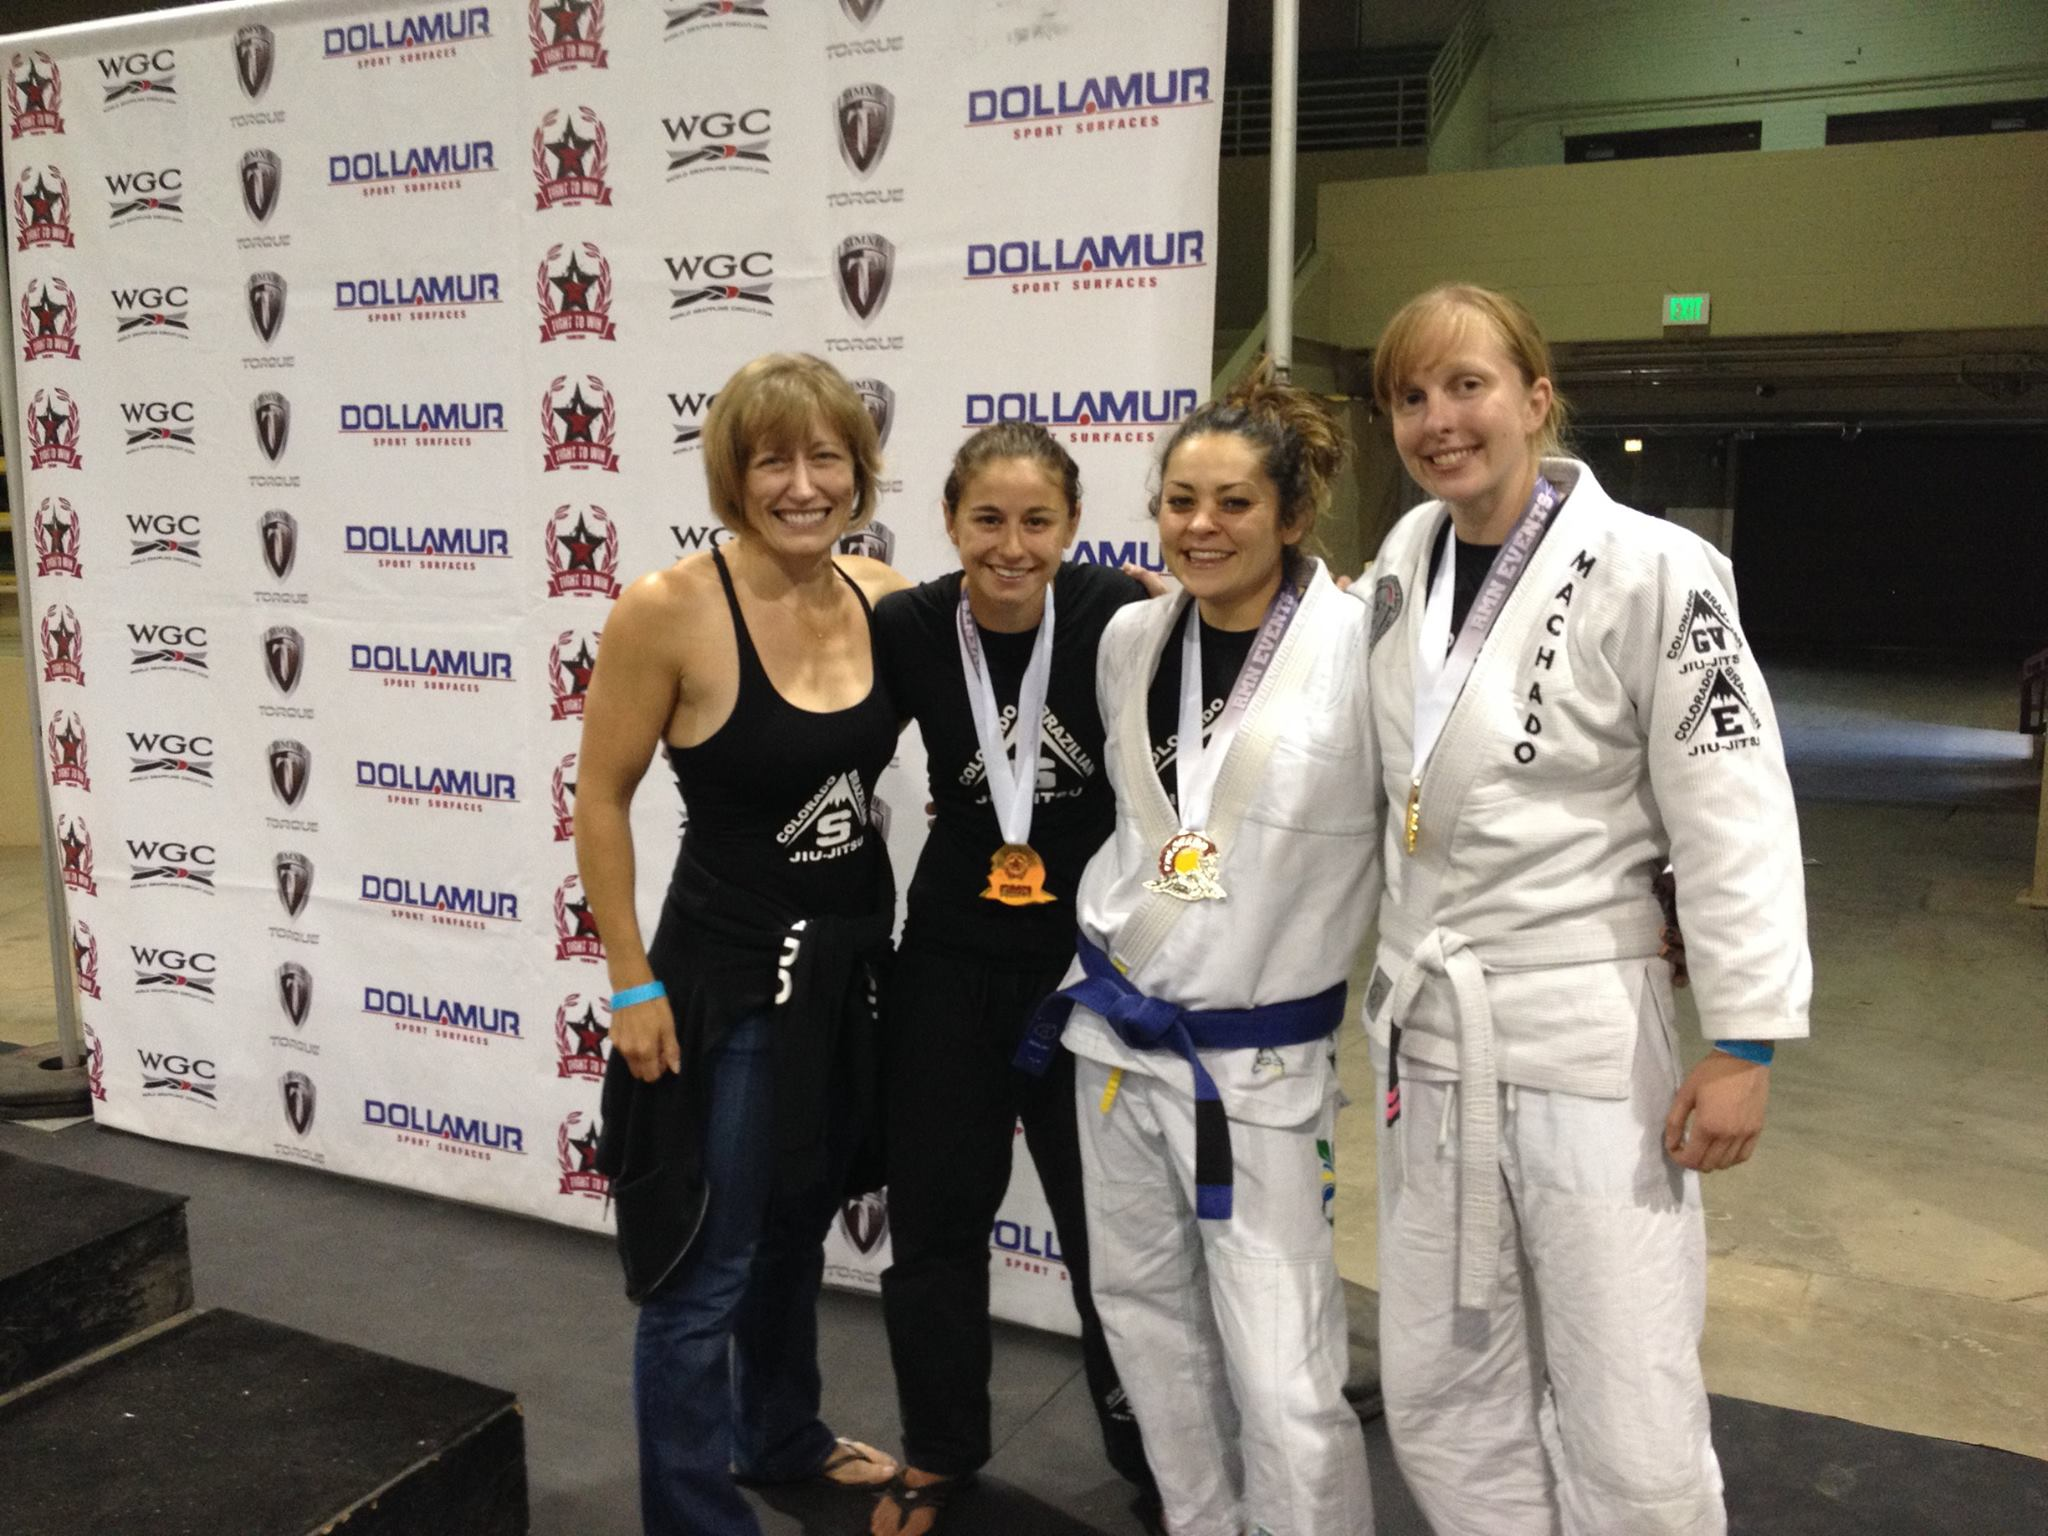 Fight To Win 2014 Colorado Open - CBJJ Stapleton Ladies Crew - Coach Teri Stewart - Rachel Ballard - Natalie DiNingrat - Shannon Shomo